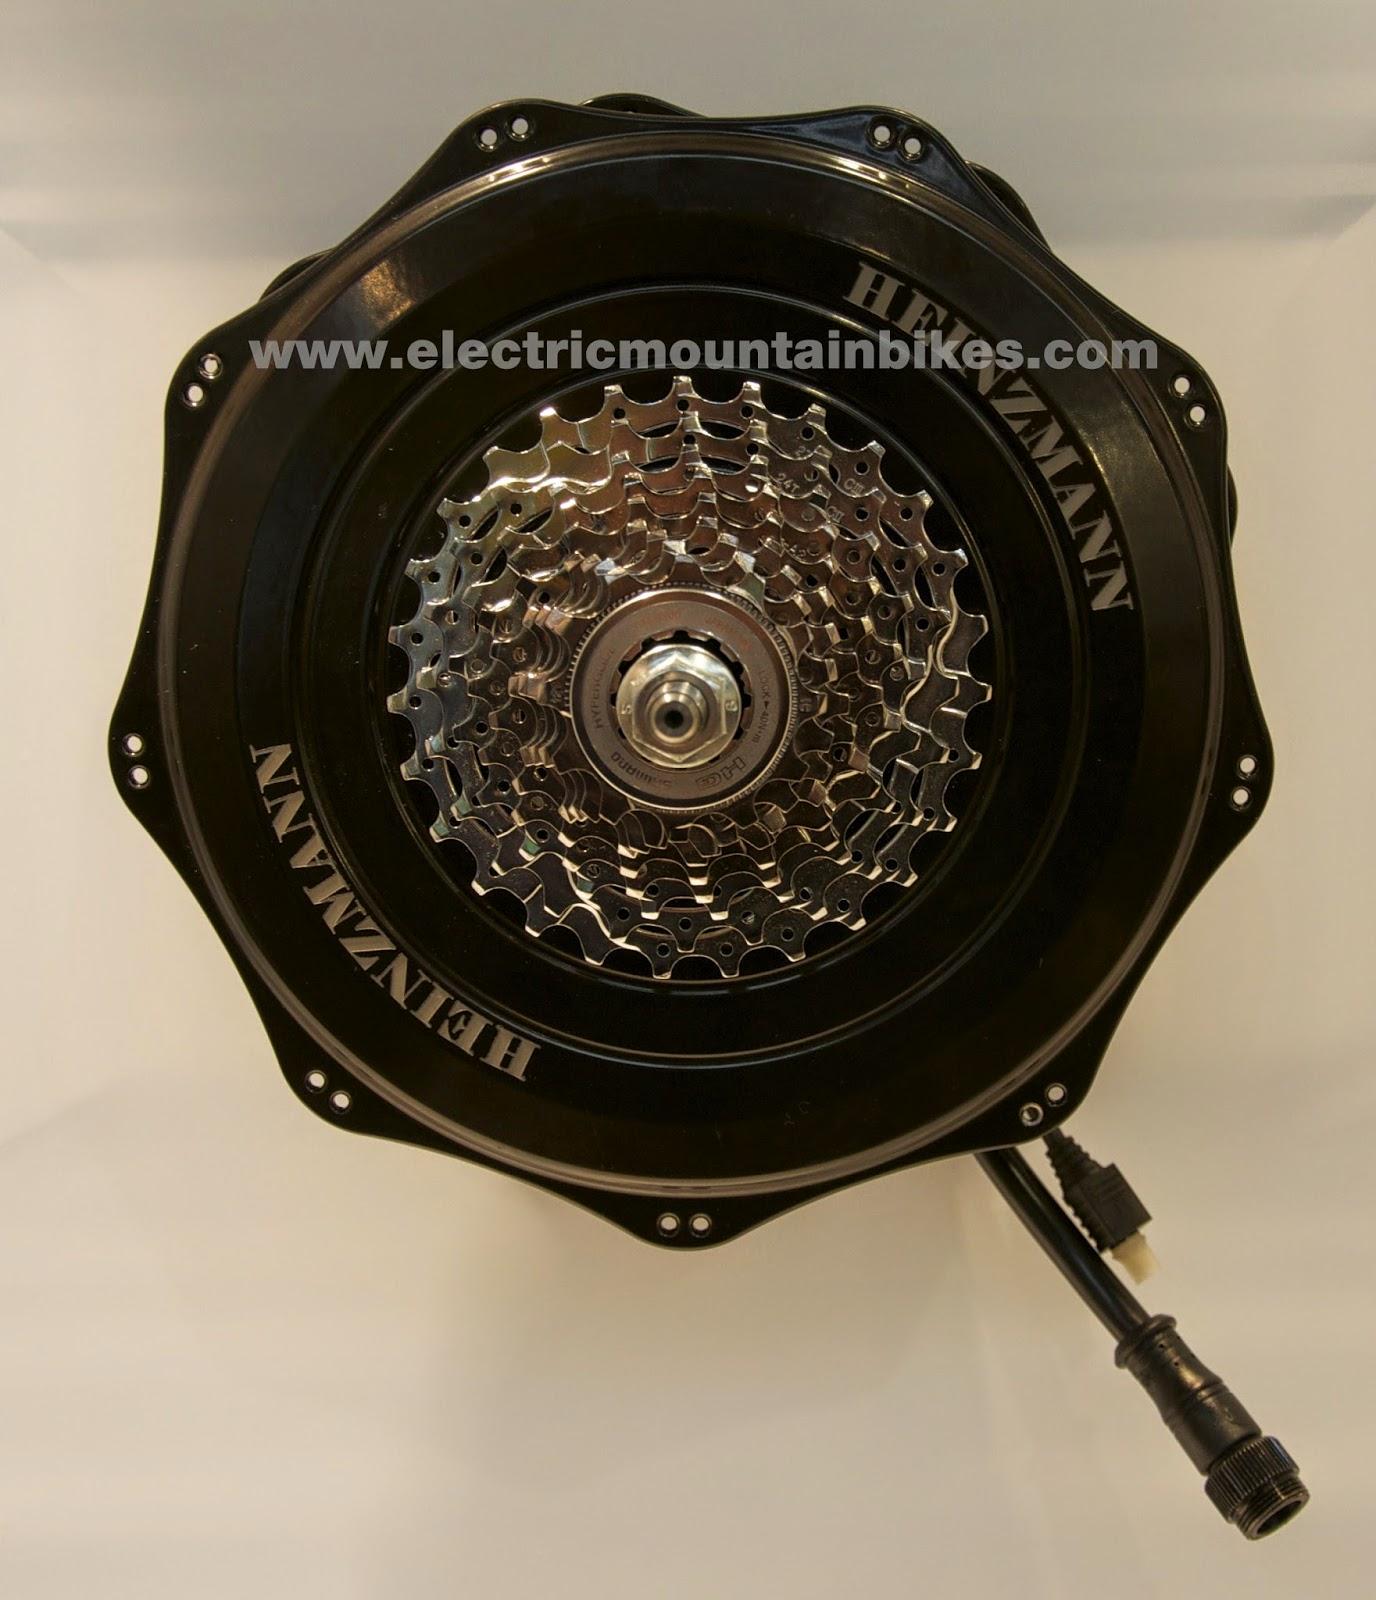 Electric Motor Retrofit Kit: ElectricMountainBikes.com: Heinzmann Direct Drive Retrofit Kit